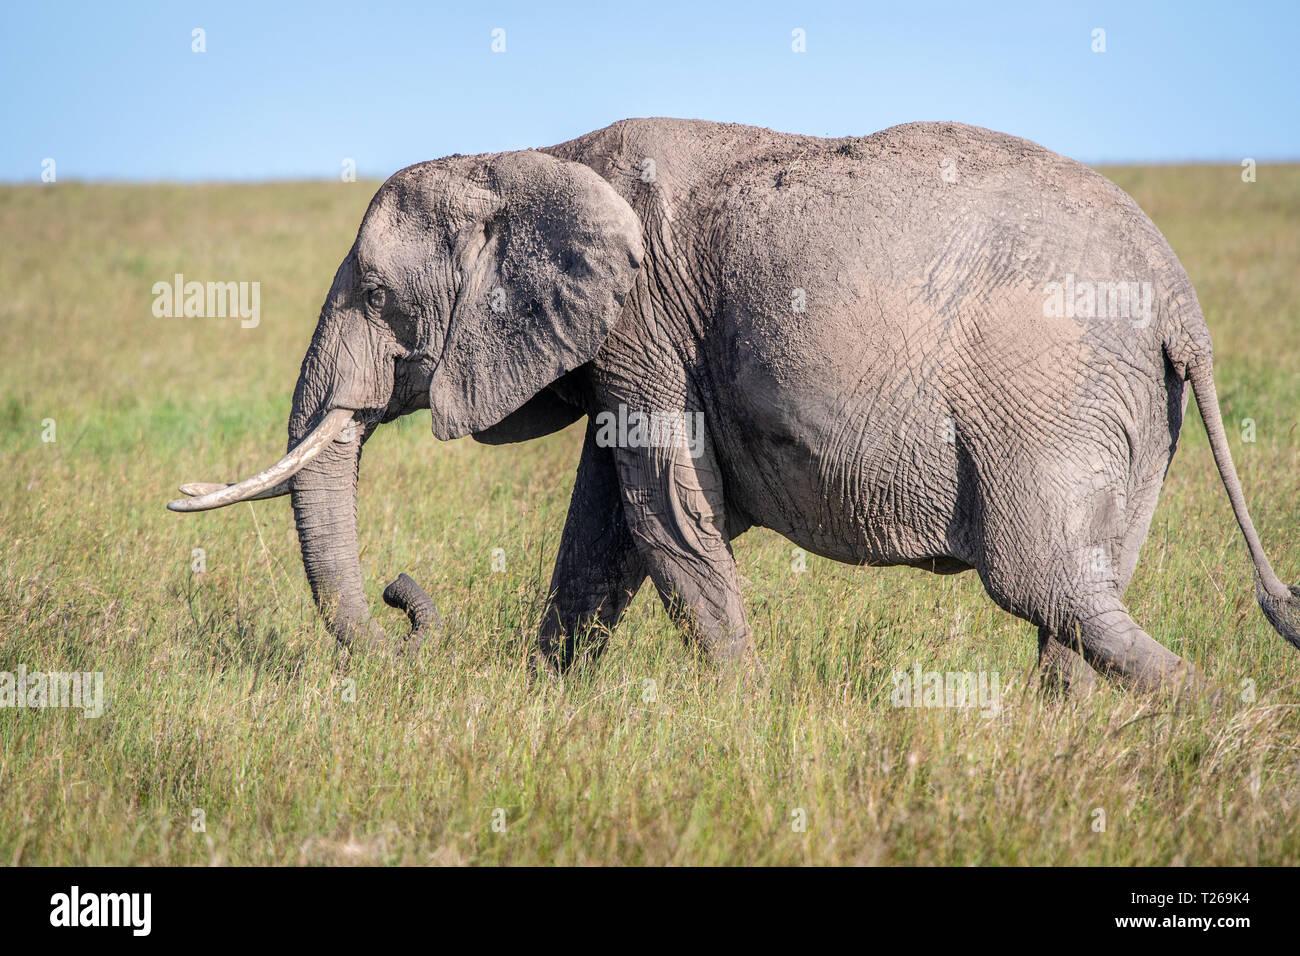 An African bush elephant (Loxodonta africana), aka African savanna elephant in Maasai Mara National Reserve , Kenya Stock Photo